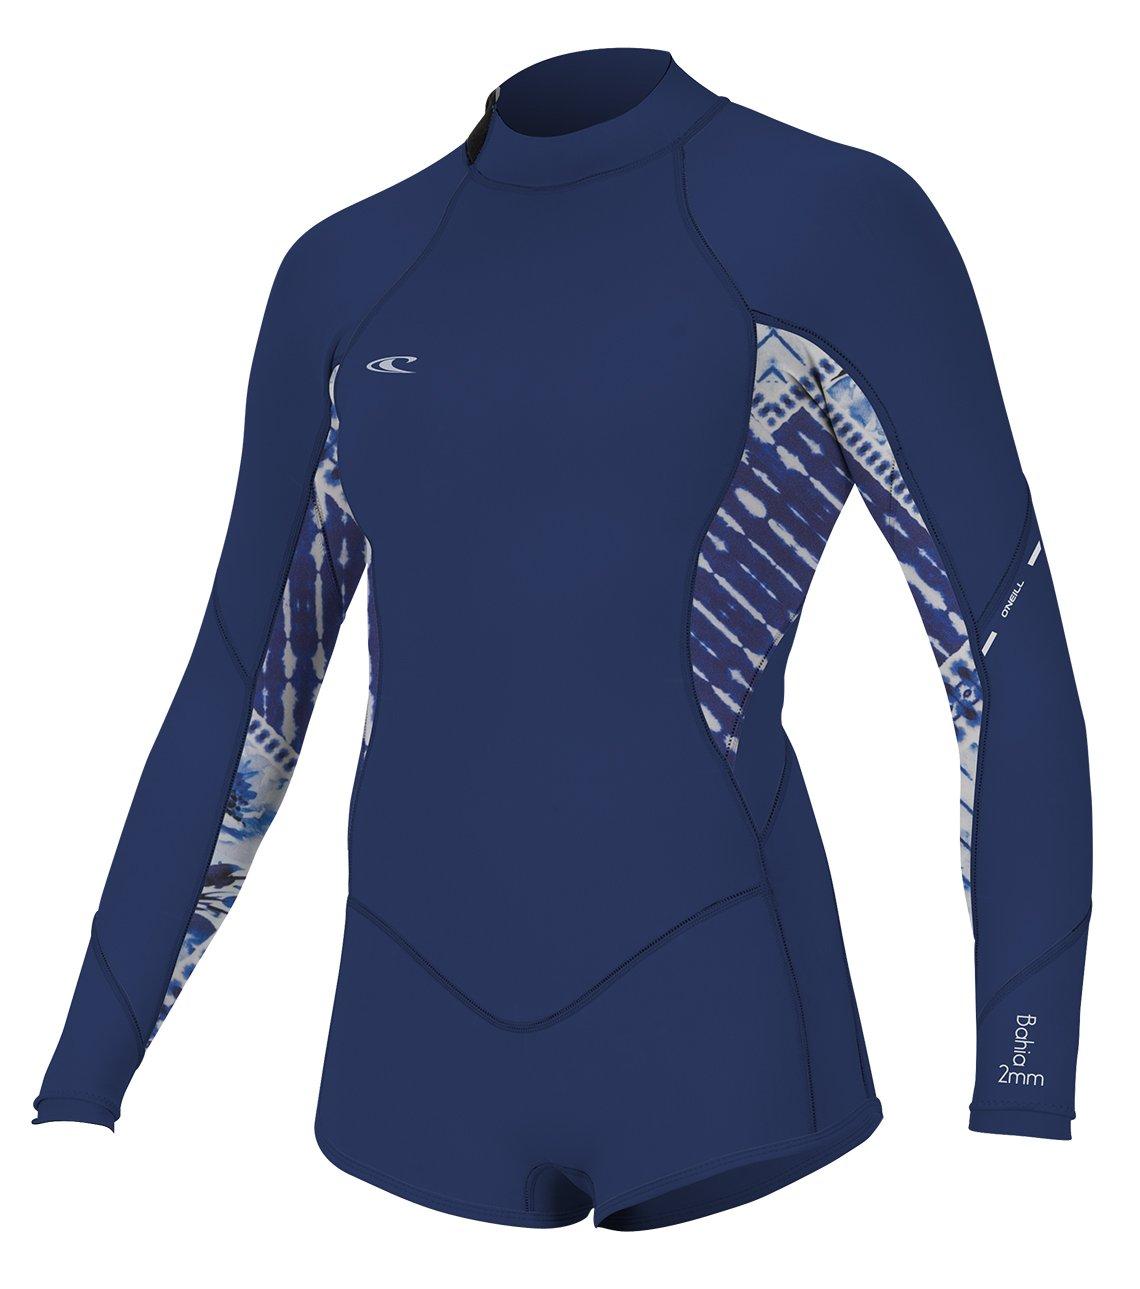 O'Neill Women's Bahia 2/1mm Back Zip Long Sleeve Short Spring Wetsuit, Navy, 4